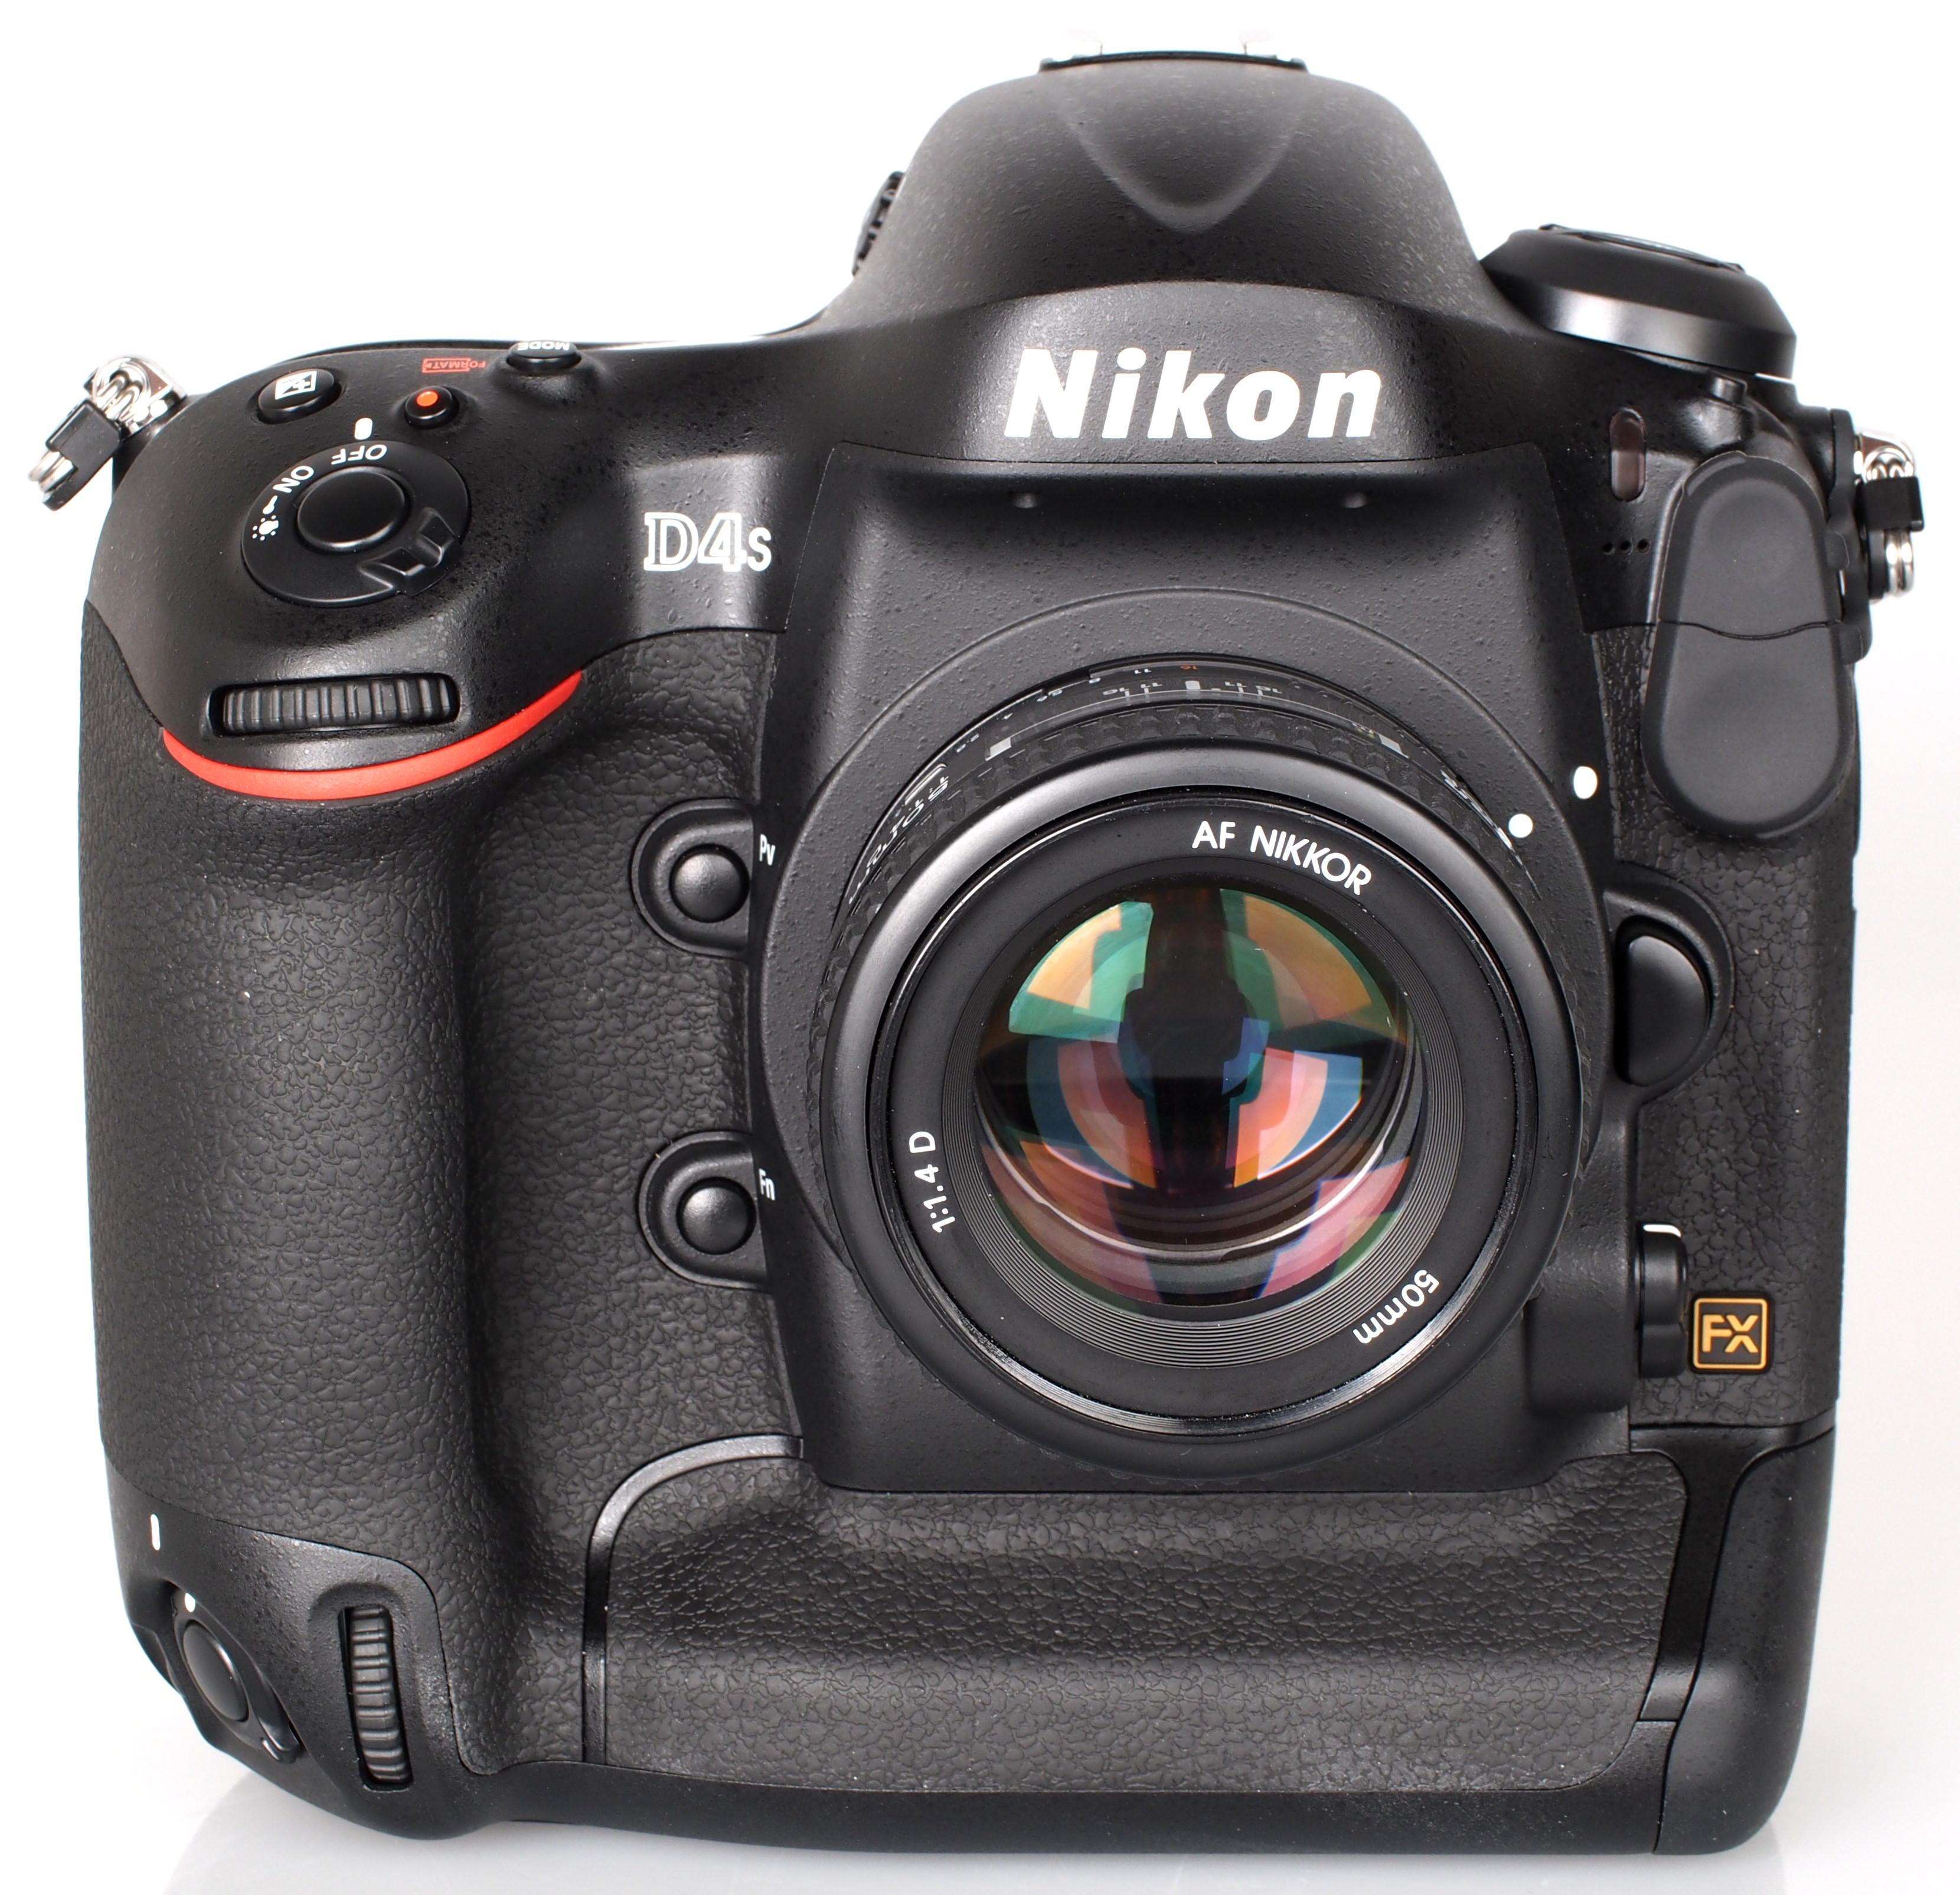 Camera Newest Dslr Cameras 2014 nikon d4s wins european professional dslr camera 2014 2015 2